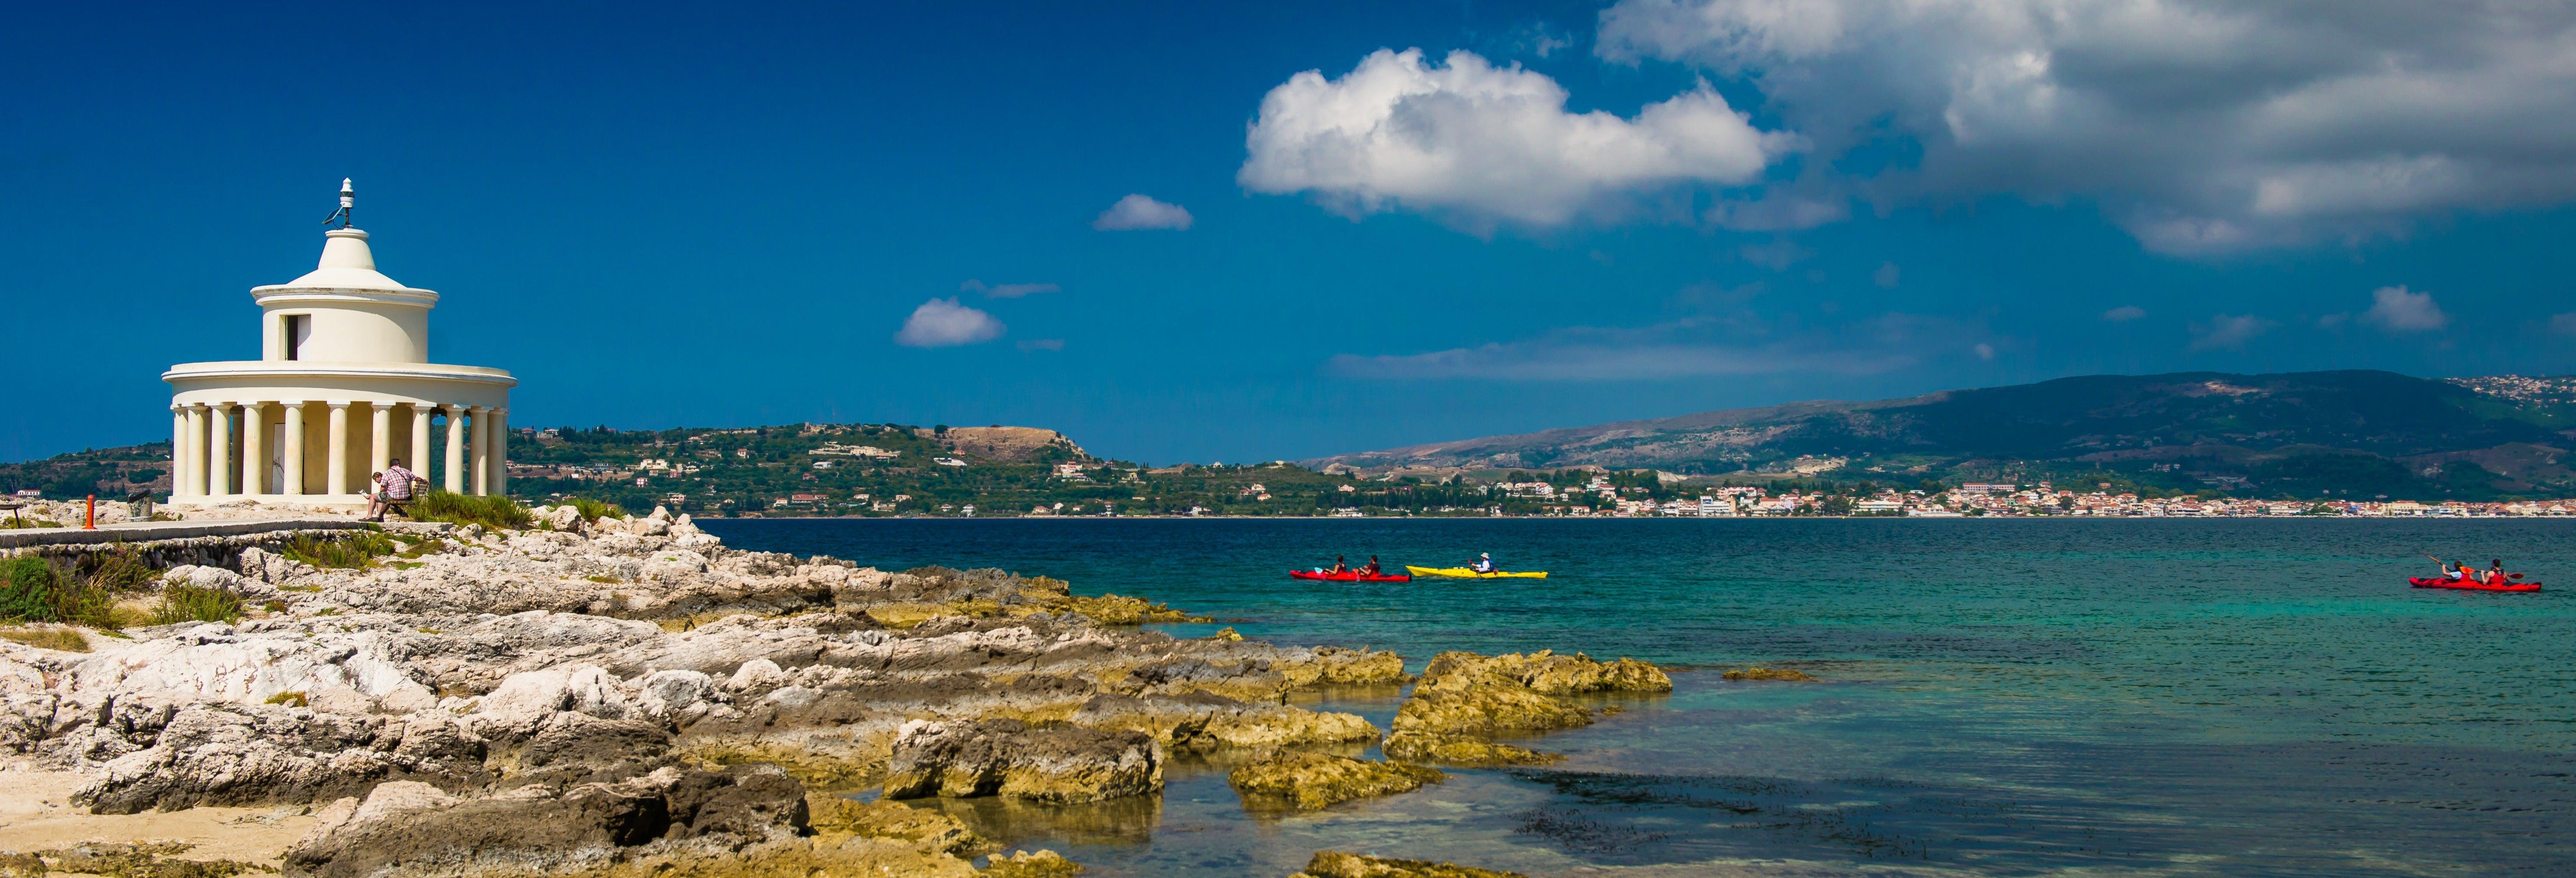 Tour en kayak por Argostoli